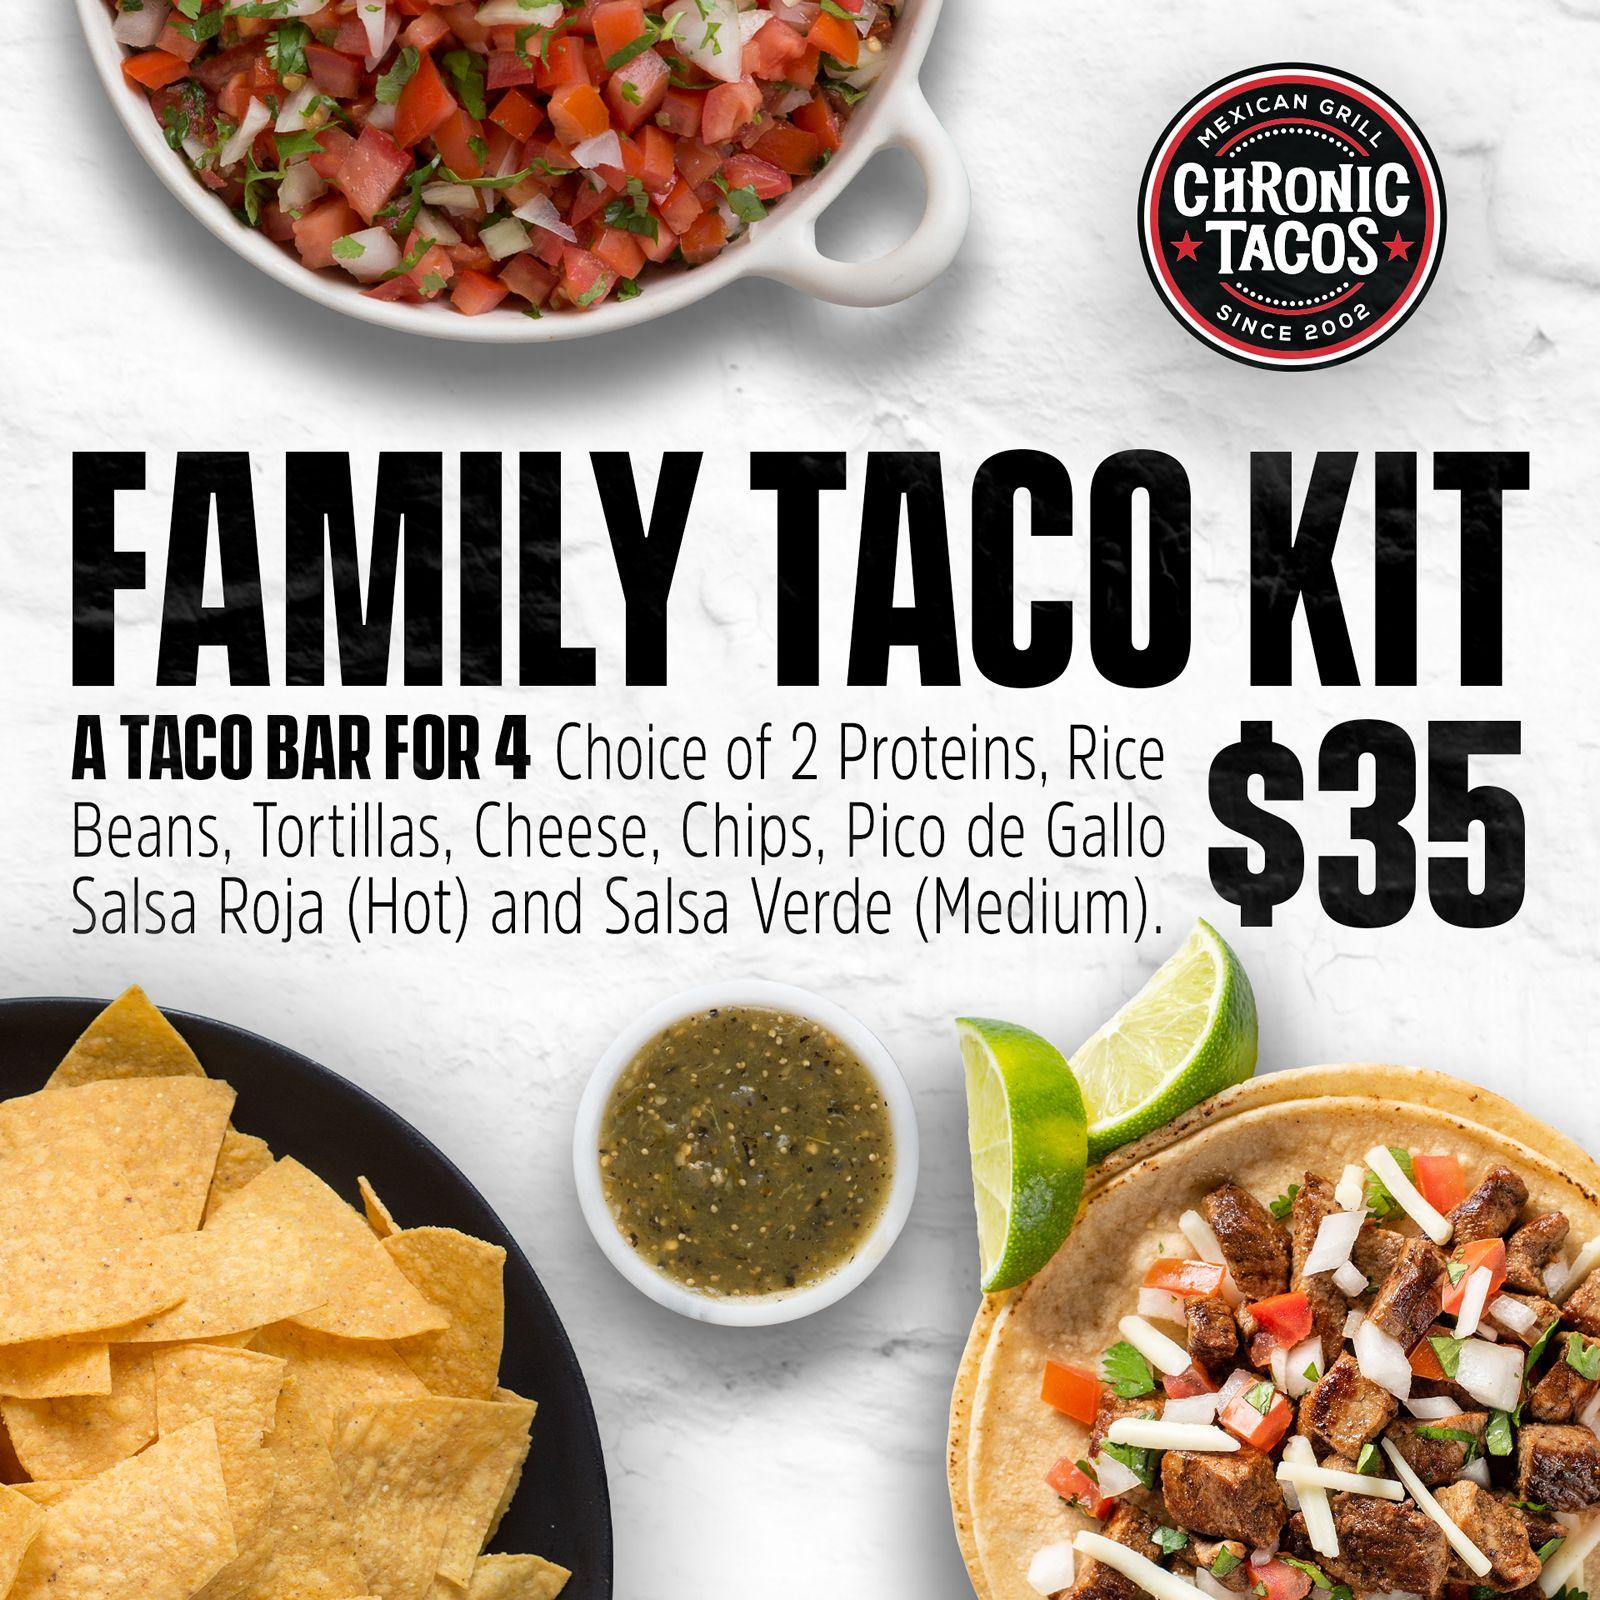 Chronic Tacos Introduces the Family Taco Kit